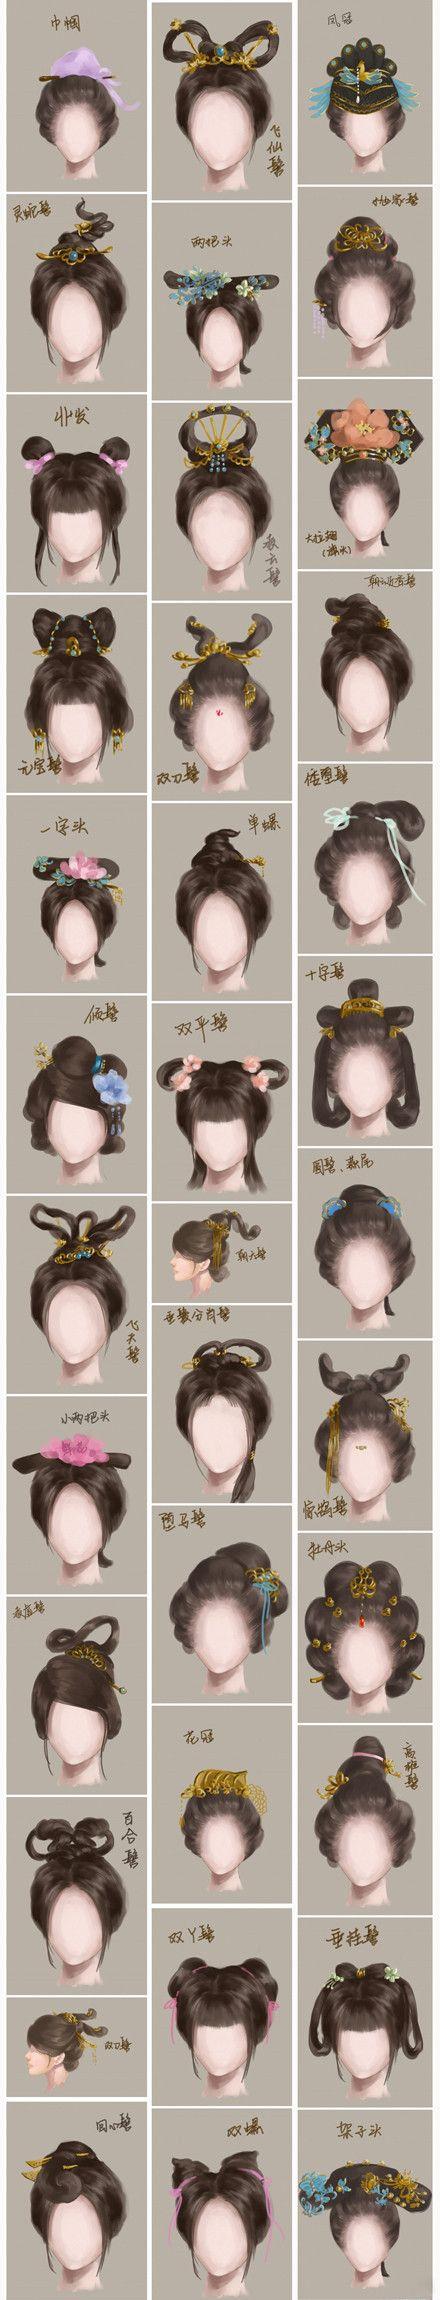 Péinate como una japonesa • Peinados japoneses